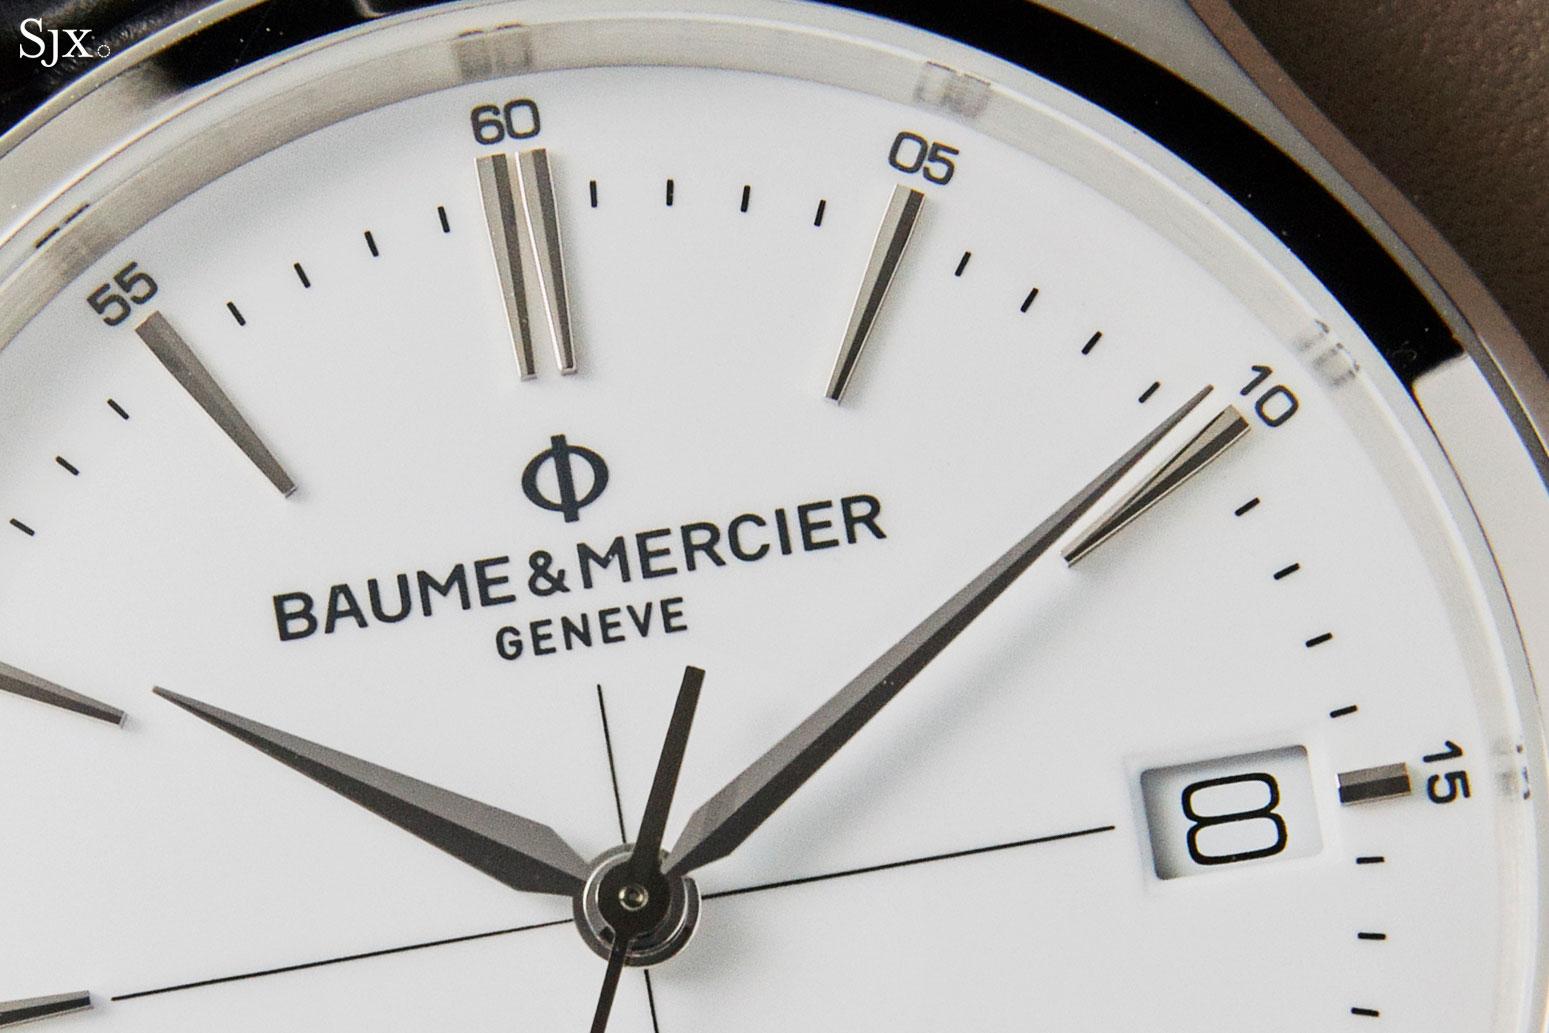 Baume Mercier Baume & Mercier Baumatic COSC chronometer 1